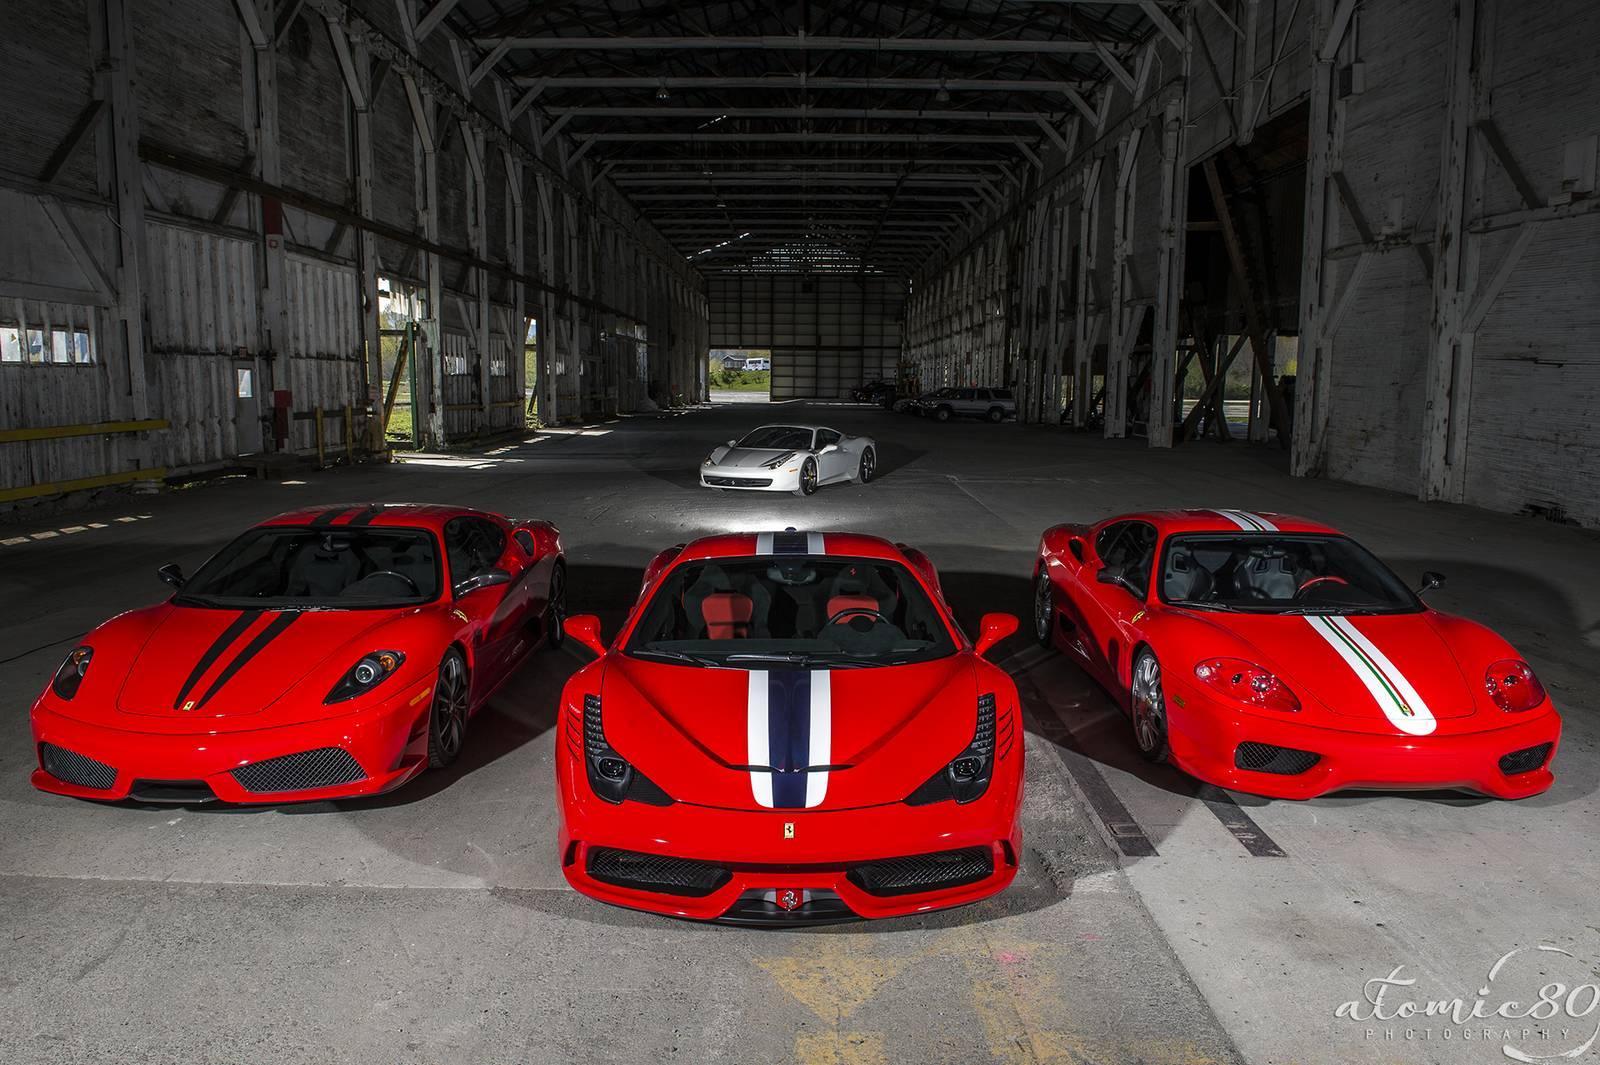 Ferrari 458 Speciale 430 Scuderia And 360 Challenge Stradale Photoshoot Gtspirit